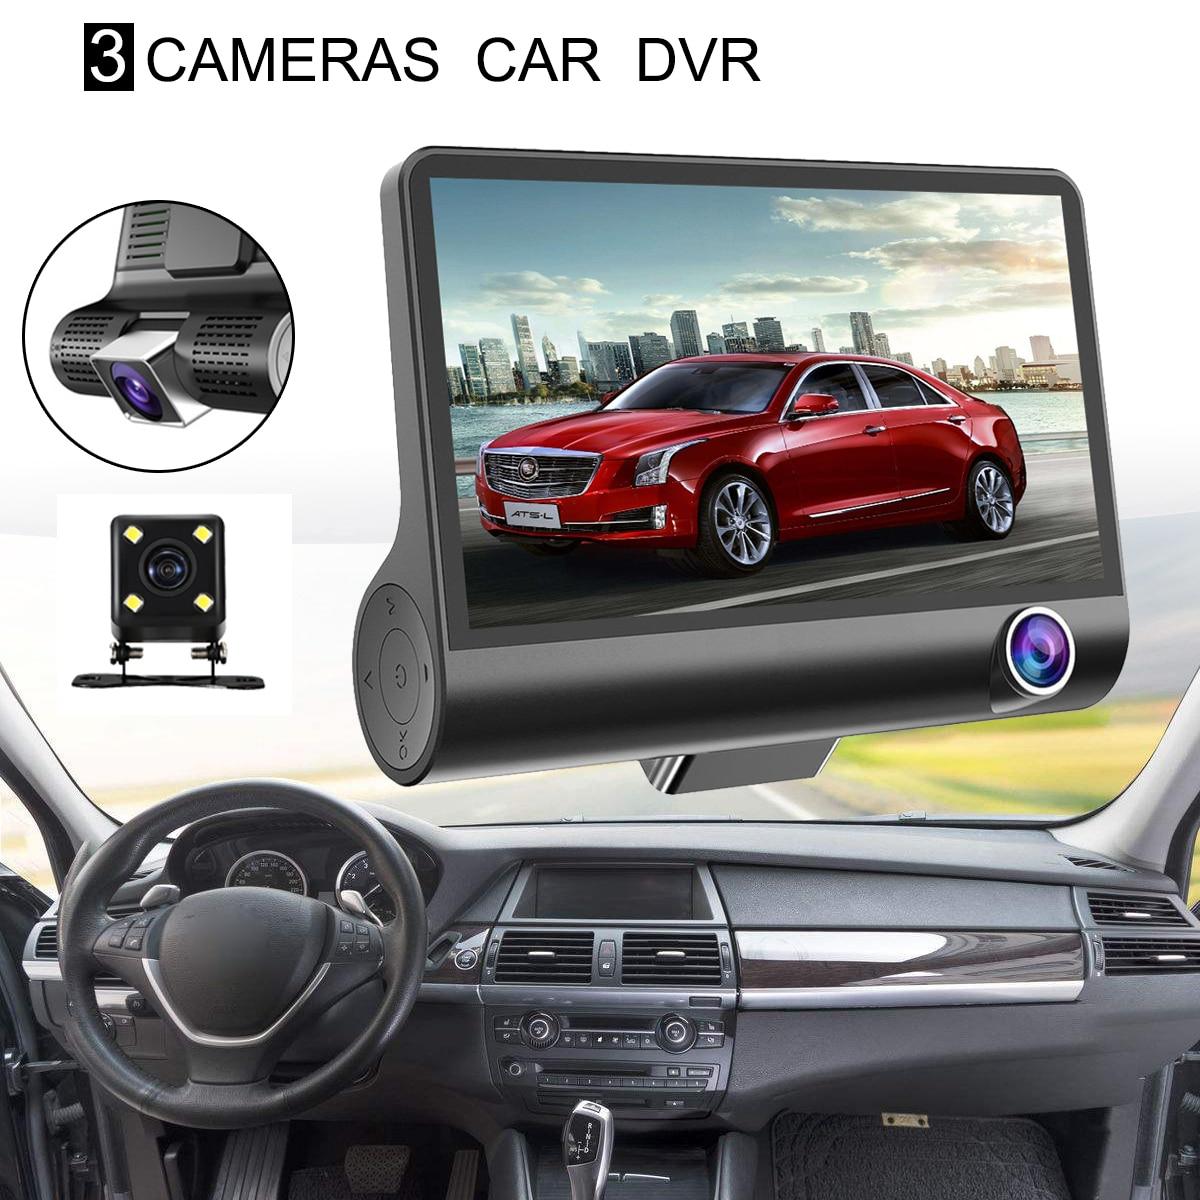 Nueva Cámara Original DVR para coche Dashcam Full HD 1080P tres lentes 4 pulgadas grabadora de vídeo g-sensor cámara de visión nocturna